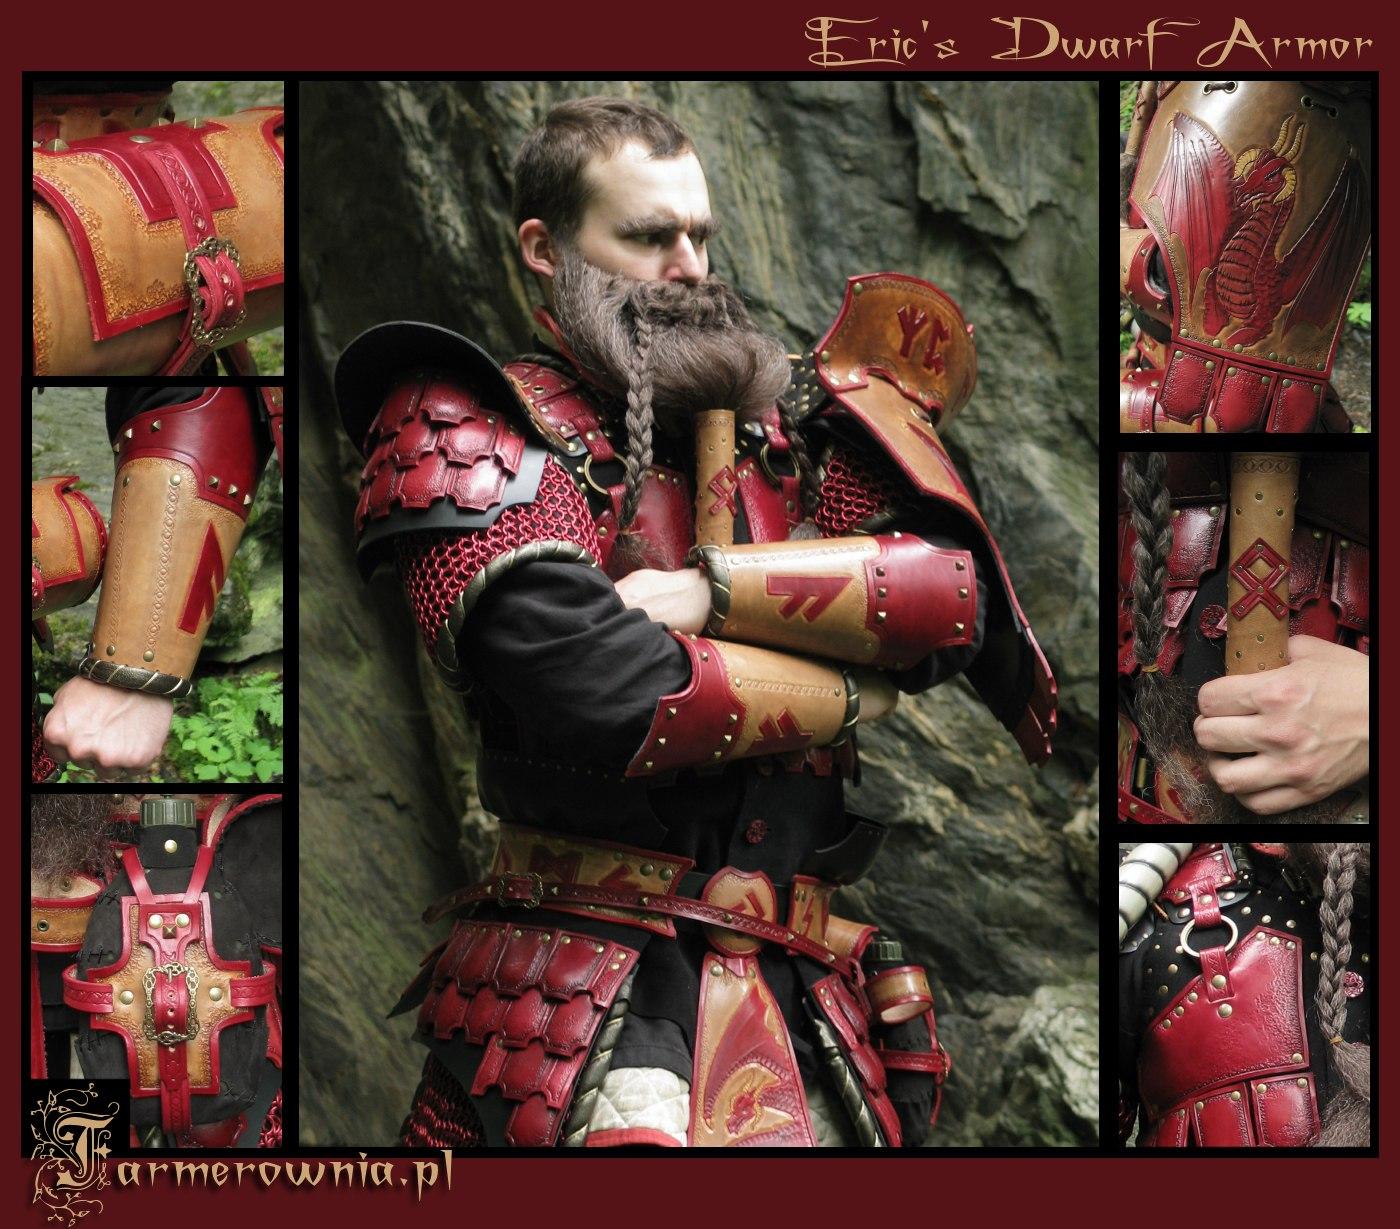 Eric's Dwarf Armor final